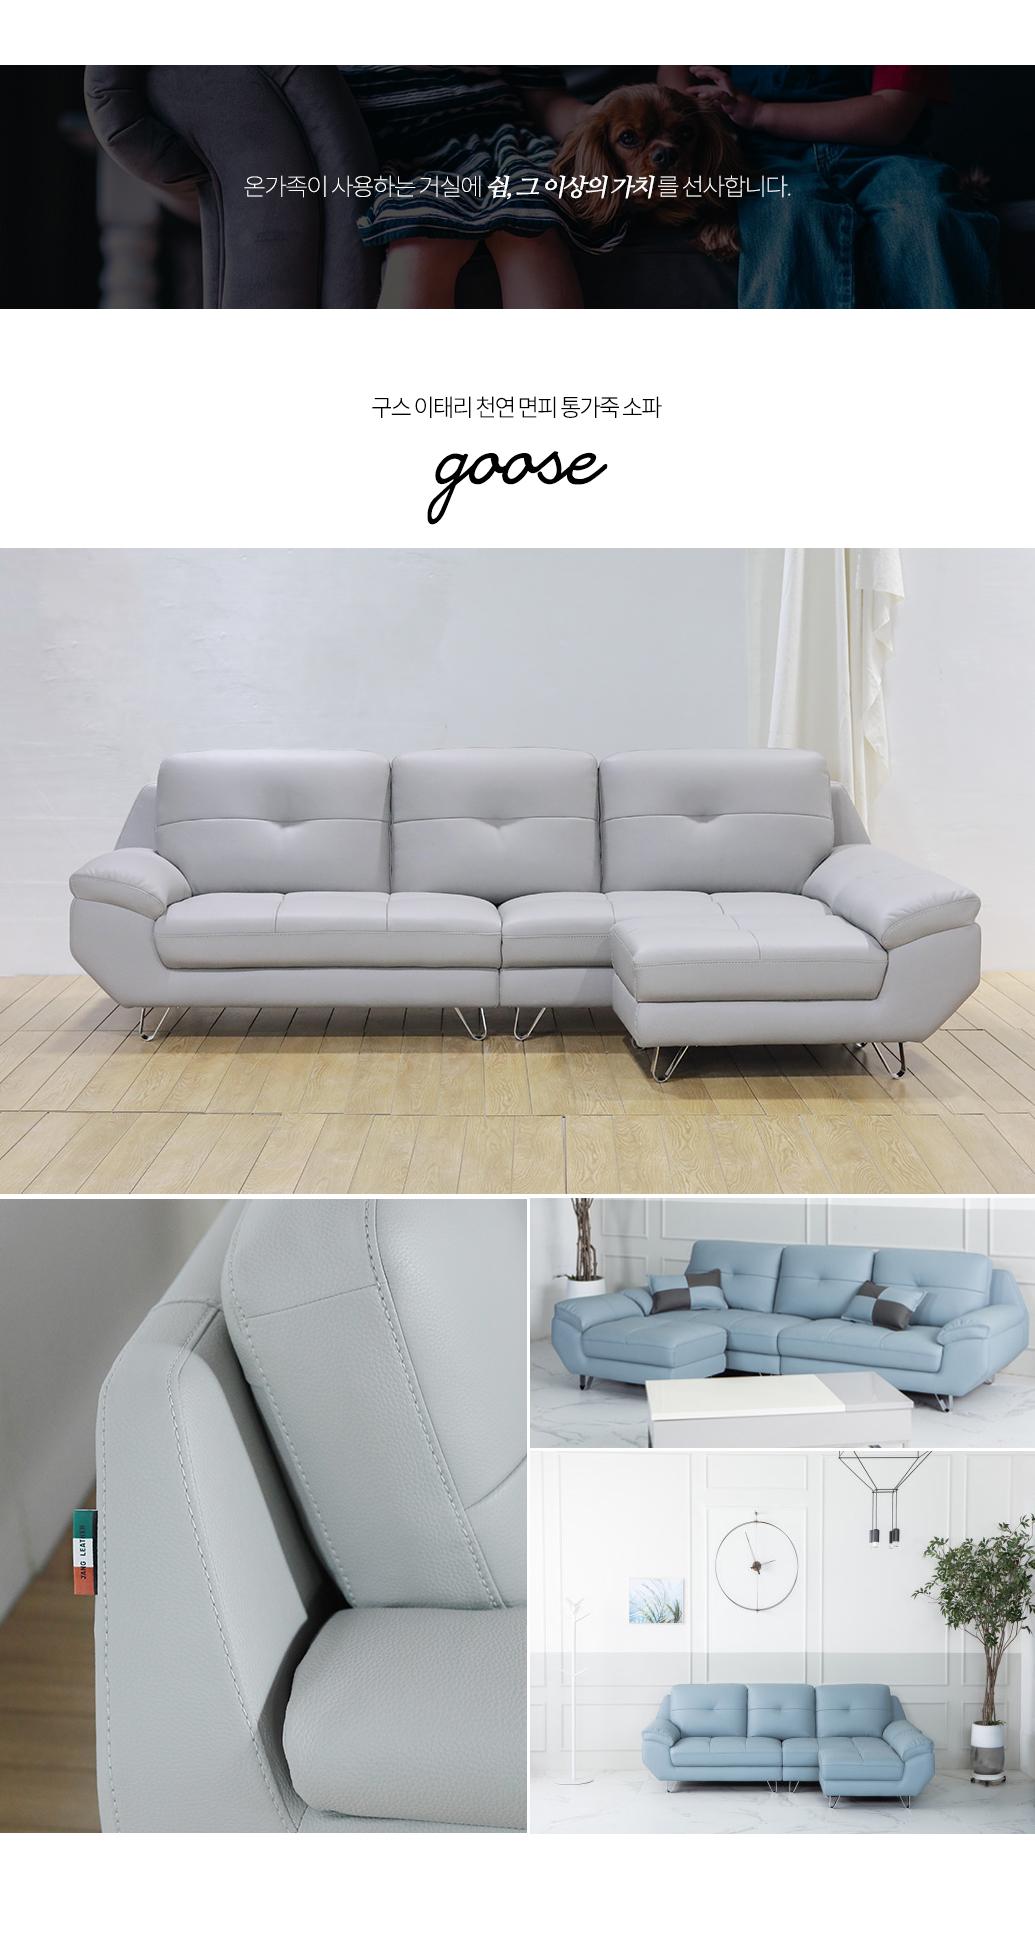 goose_08.jpg